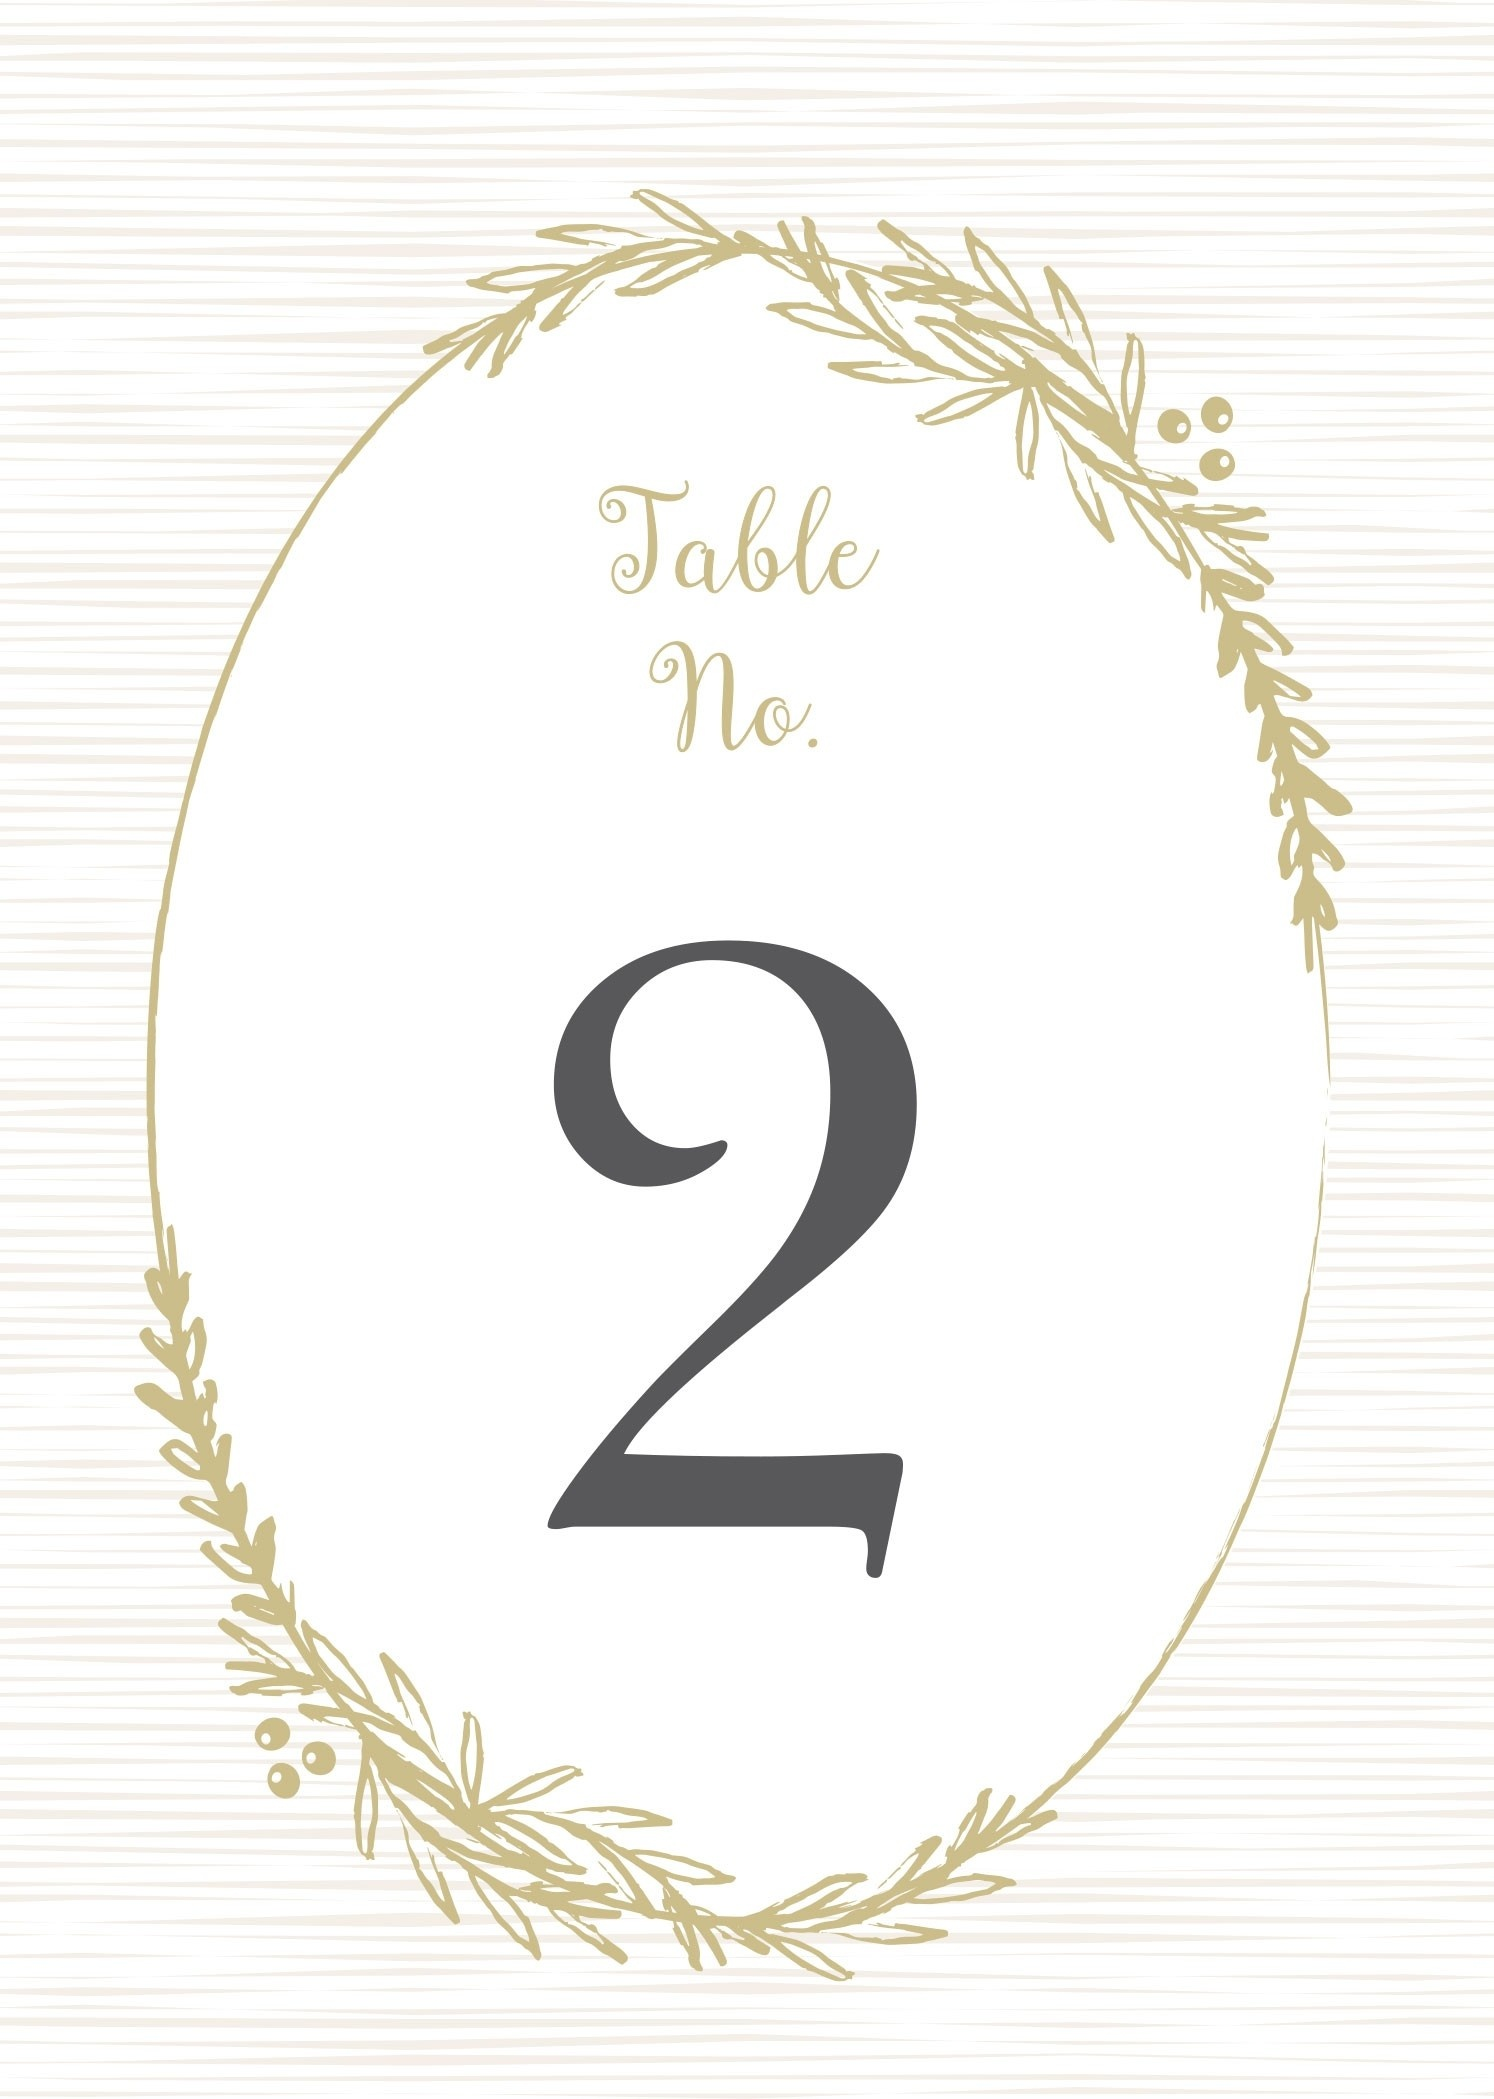 Wedding Table Numbers   Printable Pdfbasic Invite - Free Printable Table Numbers 1 30